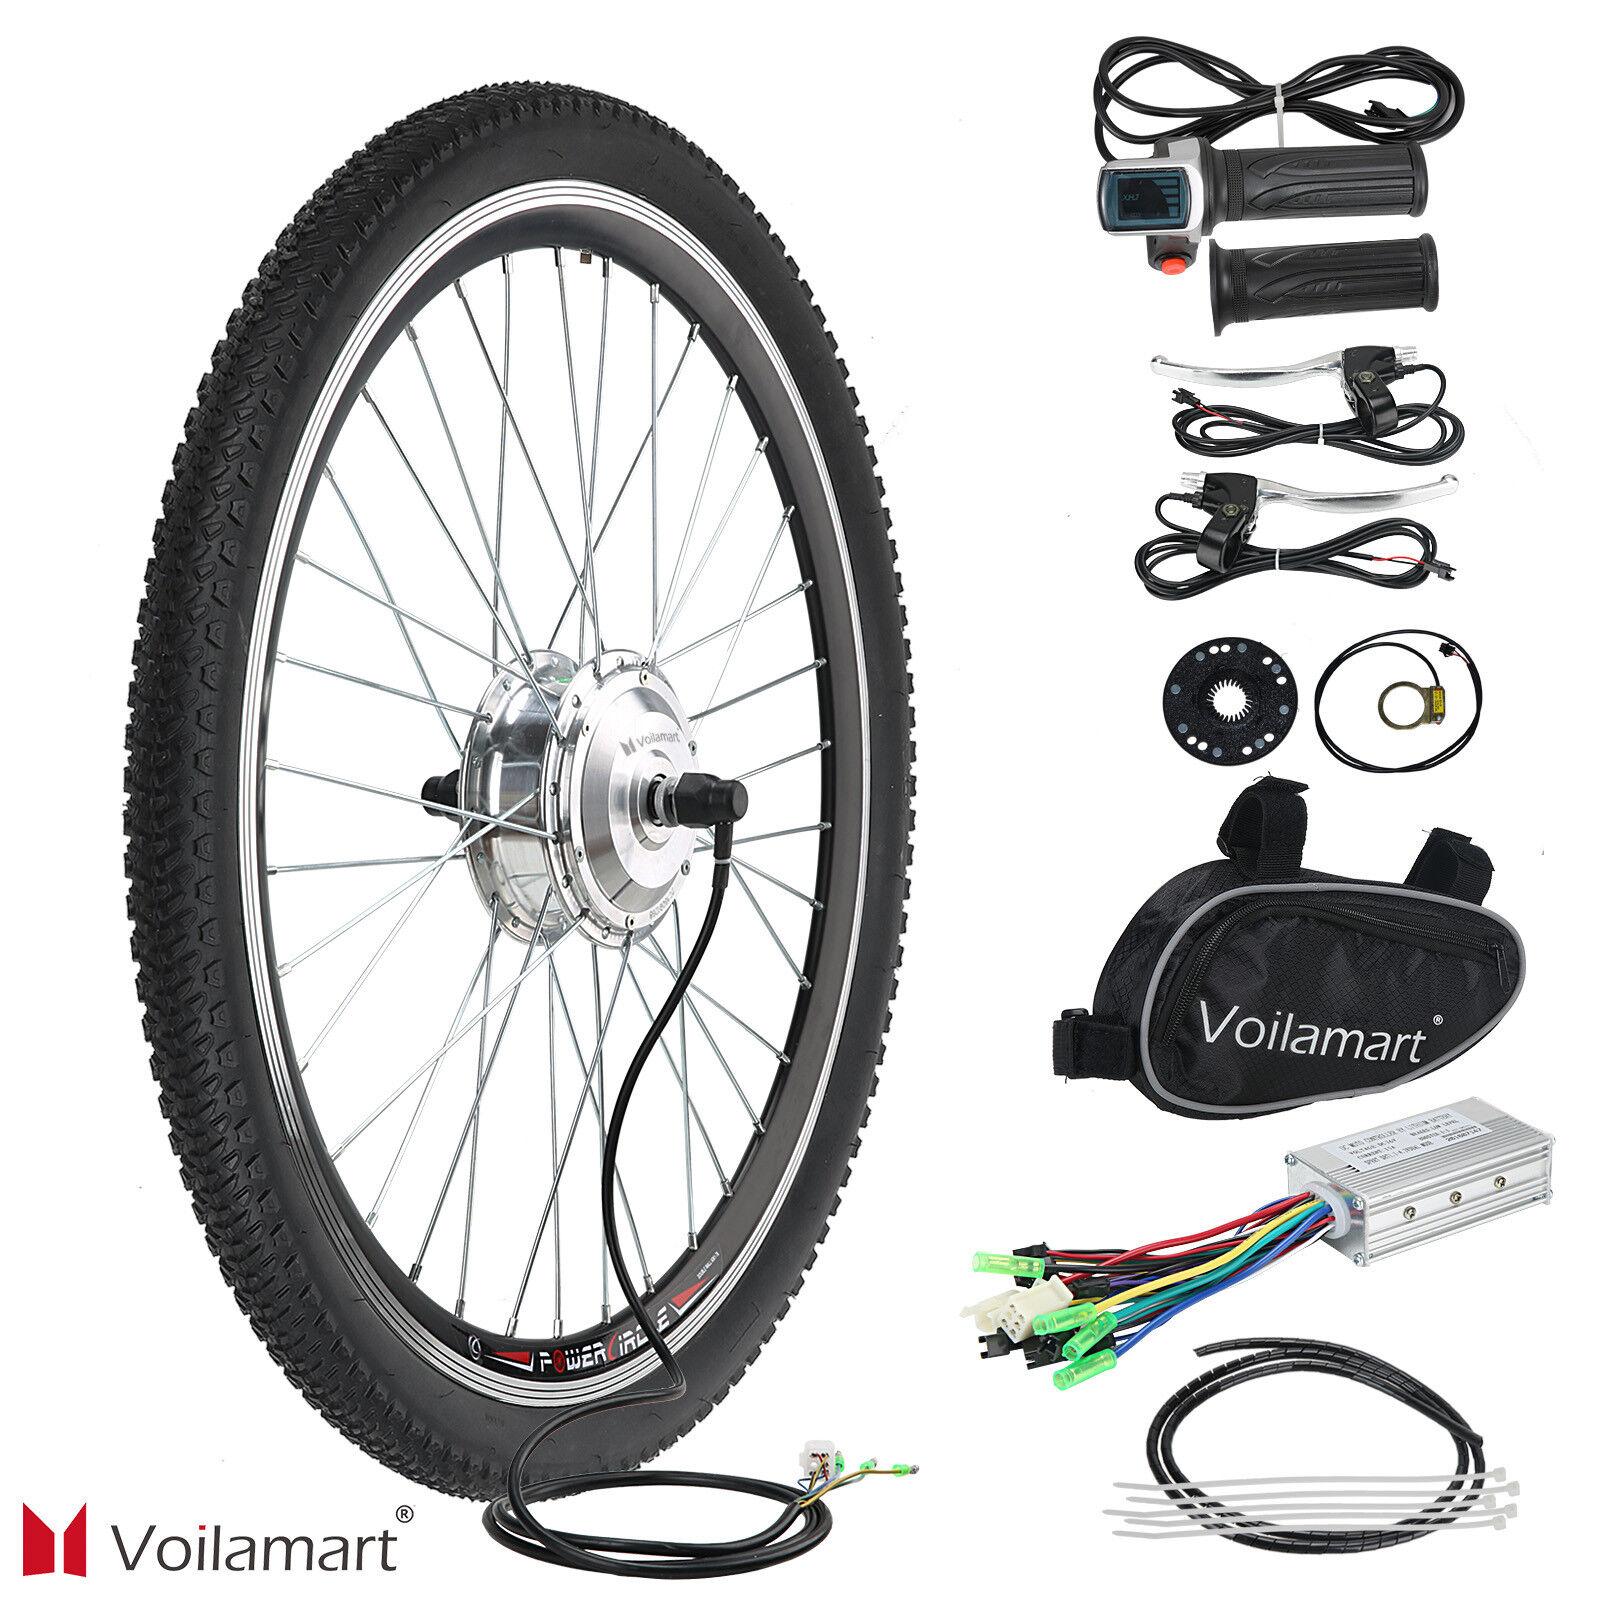 "Vorderrad 36V 250W 26"" Zoll E-Bike Conversion Kit Kit Kit Elektrofahrrad Umbausatz Neu 3c3f97"